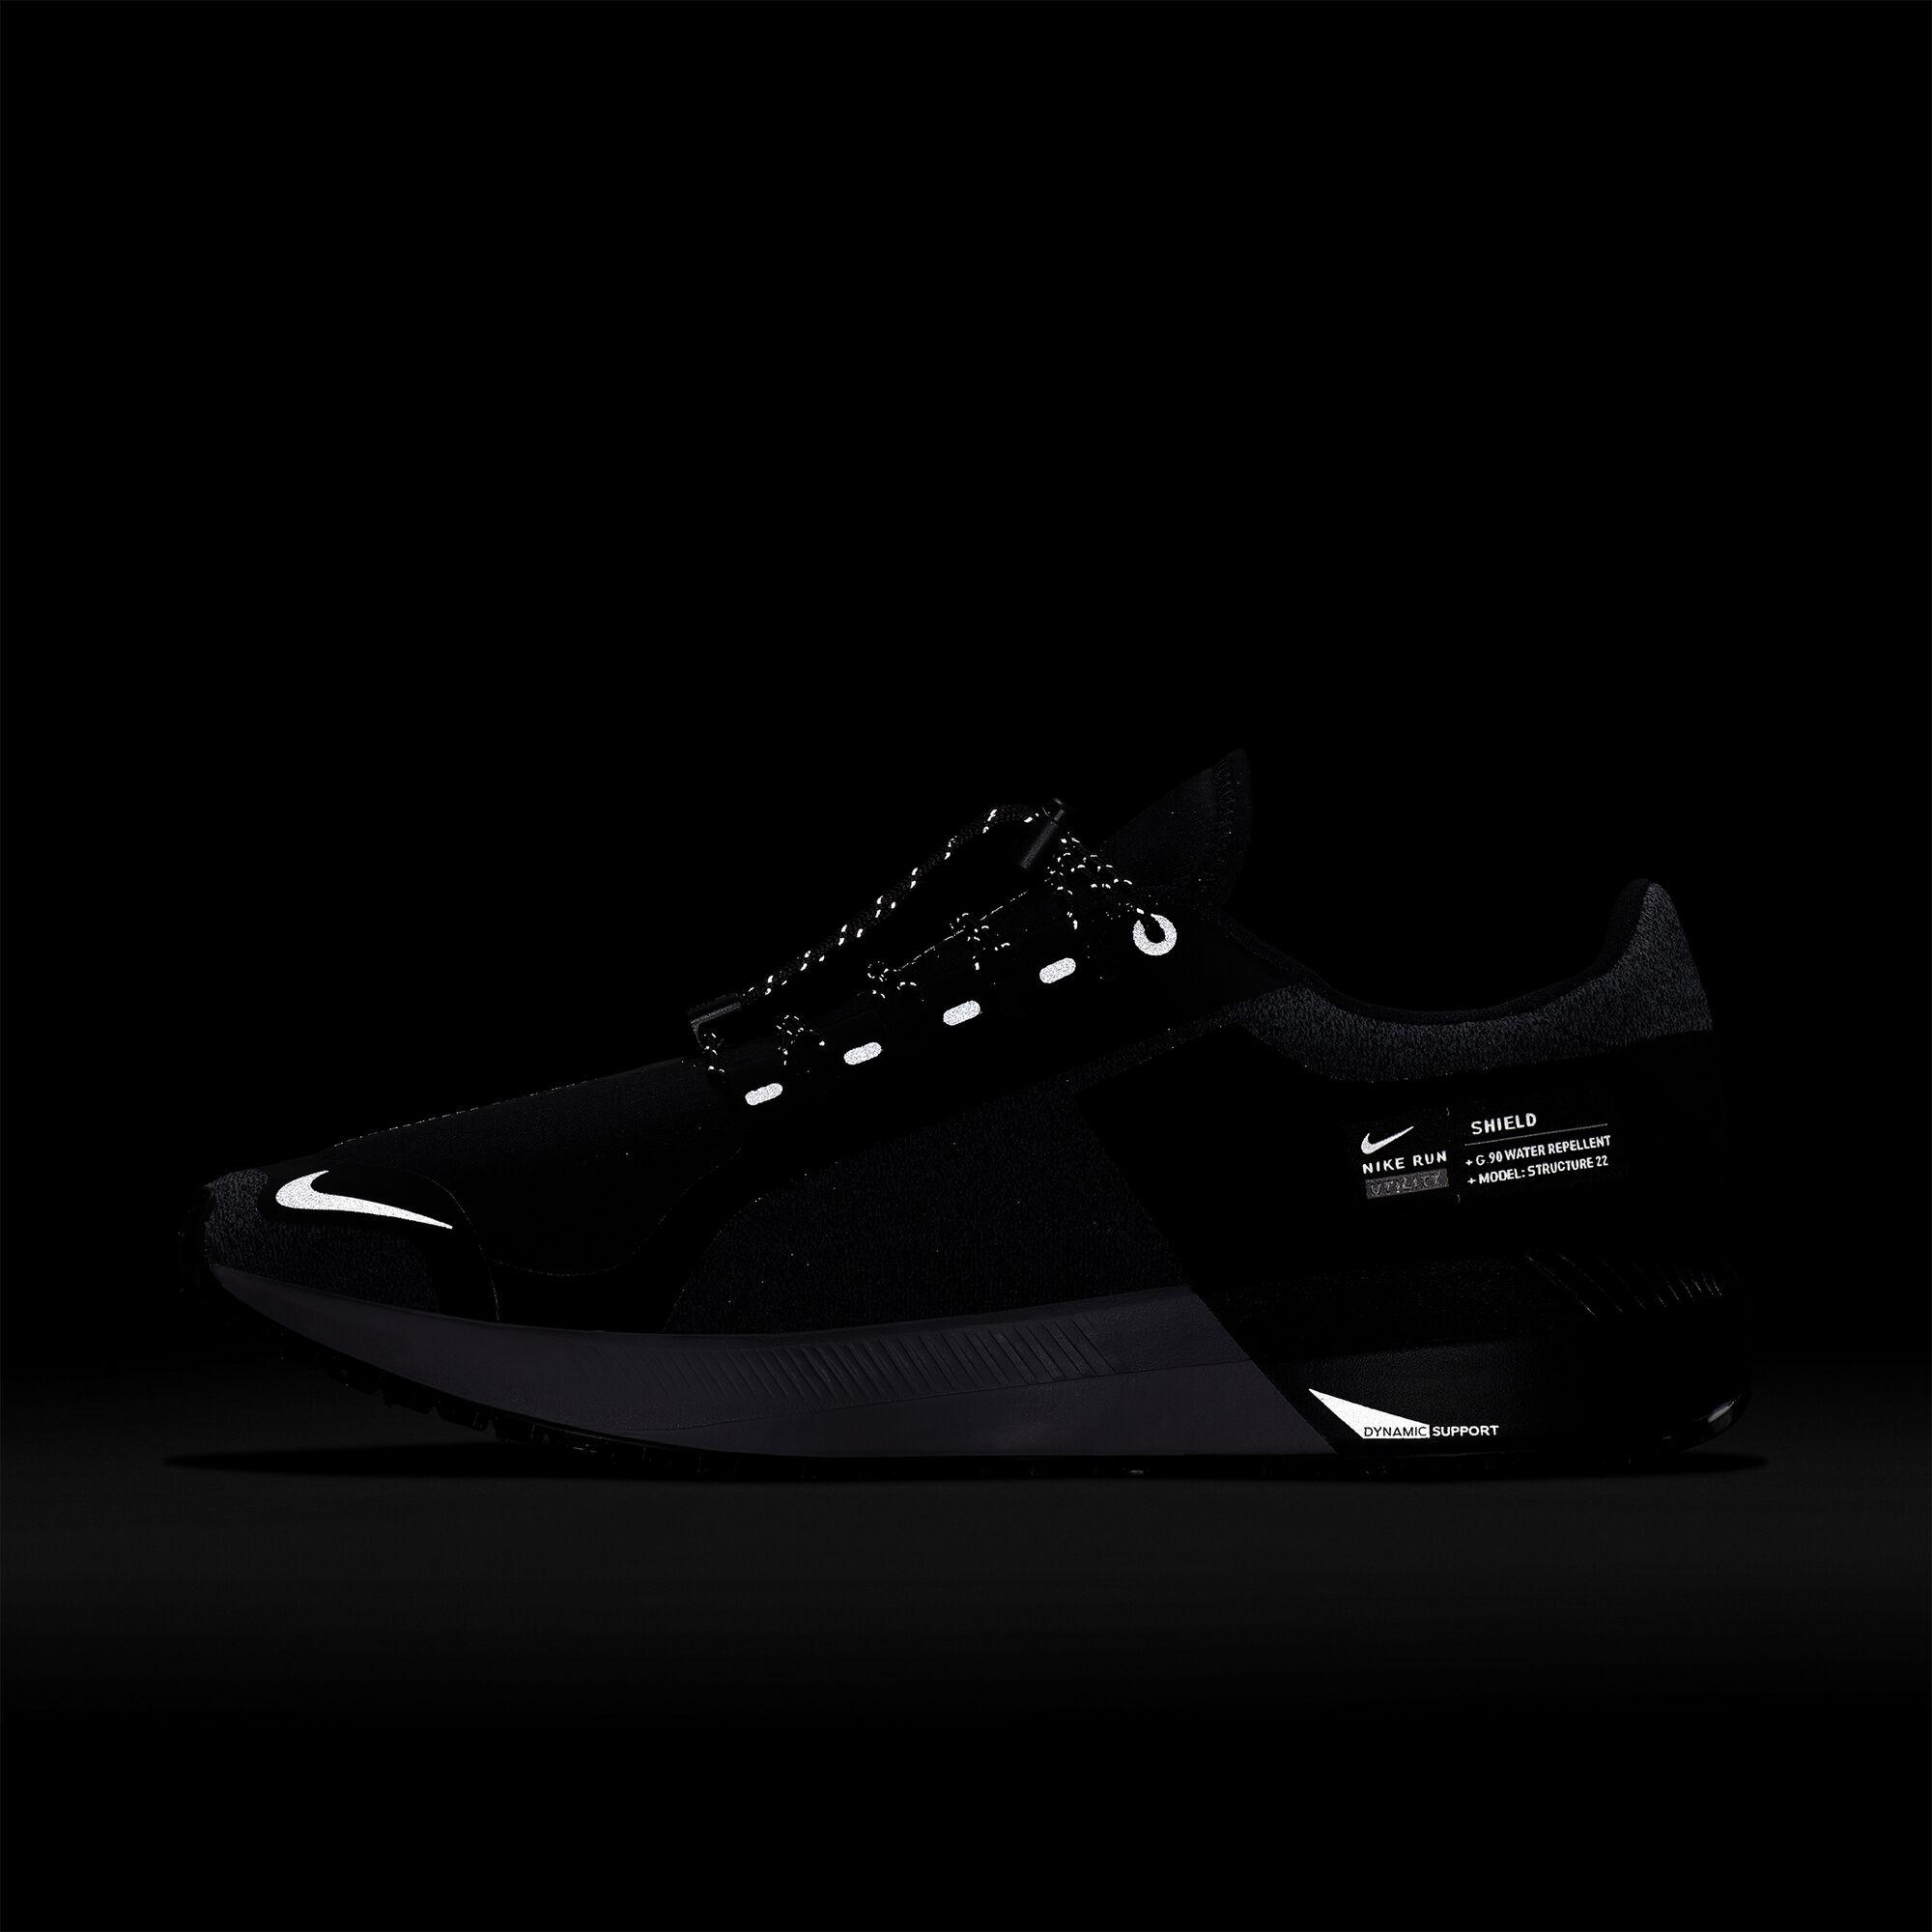 f579687dd7e5c buy Nike Air Zoom Structure 22 Shield Stability Running Shoe Men ...